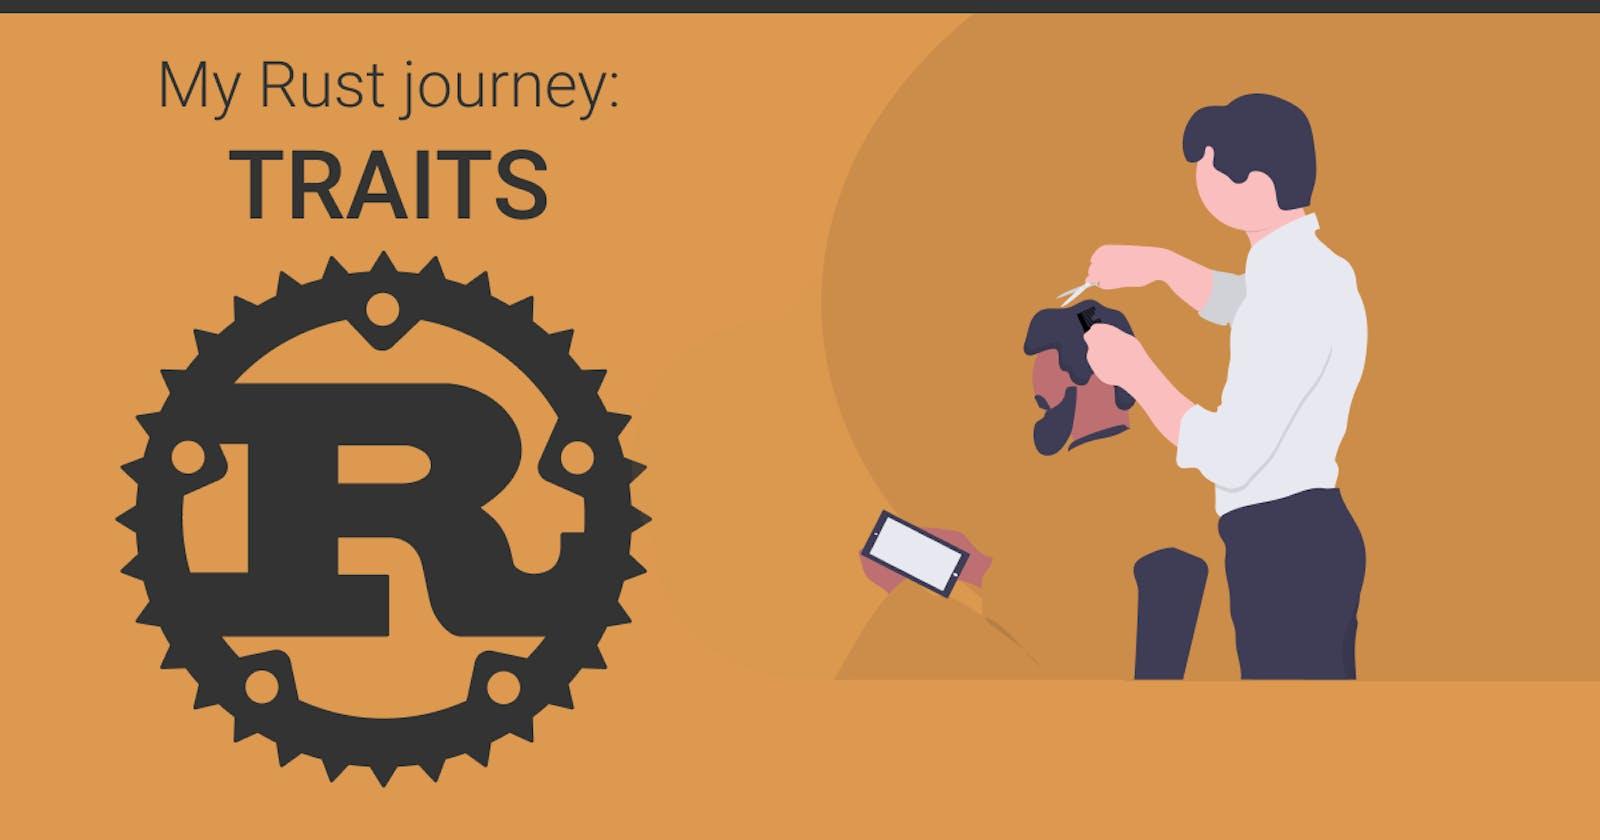 My Rust journey: Traits